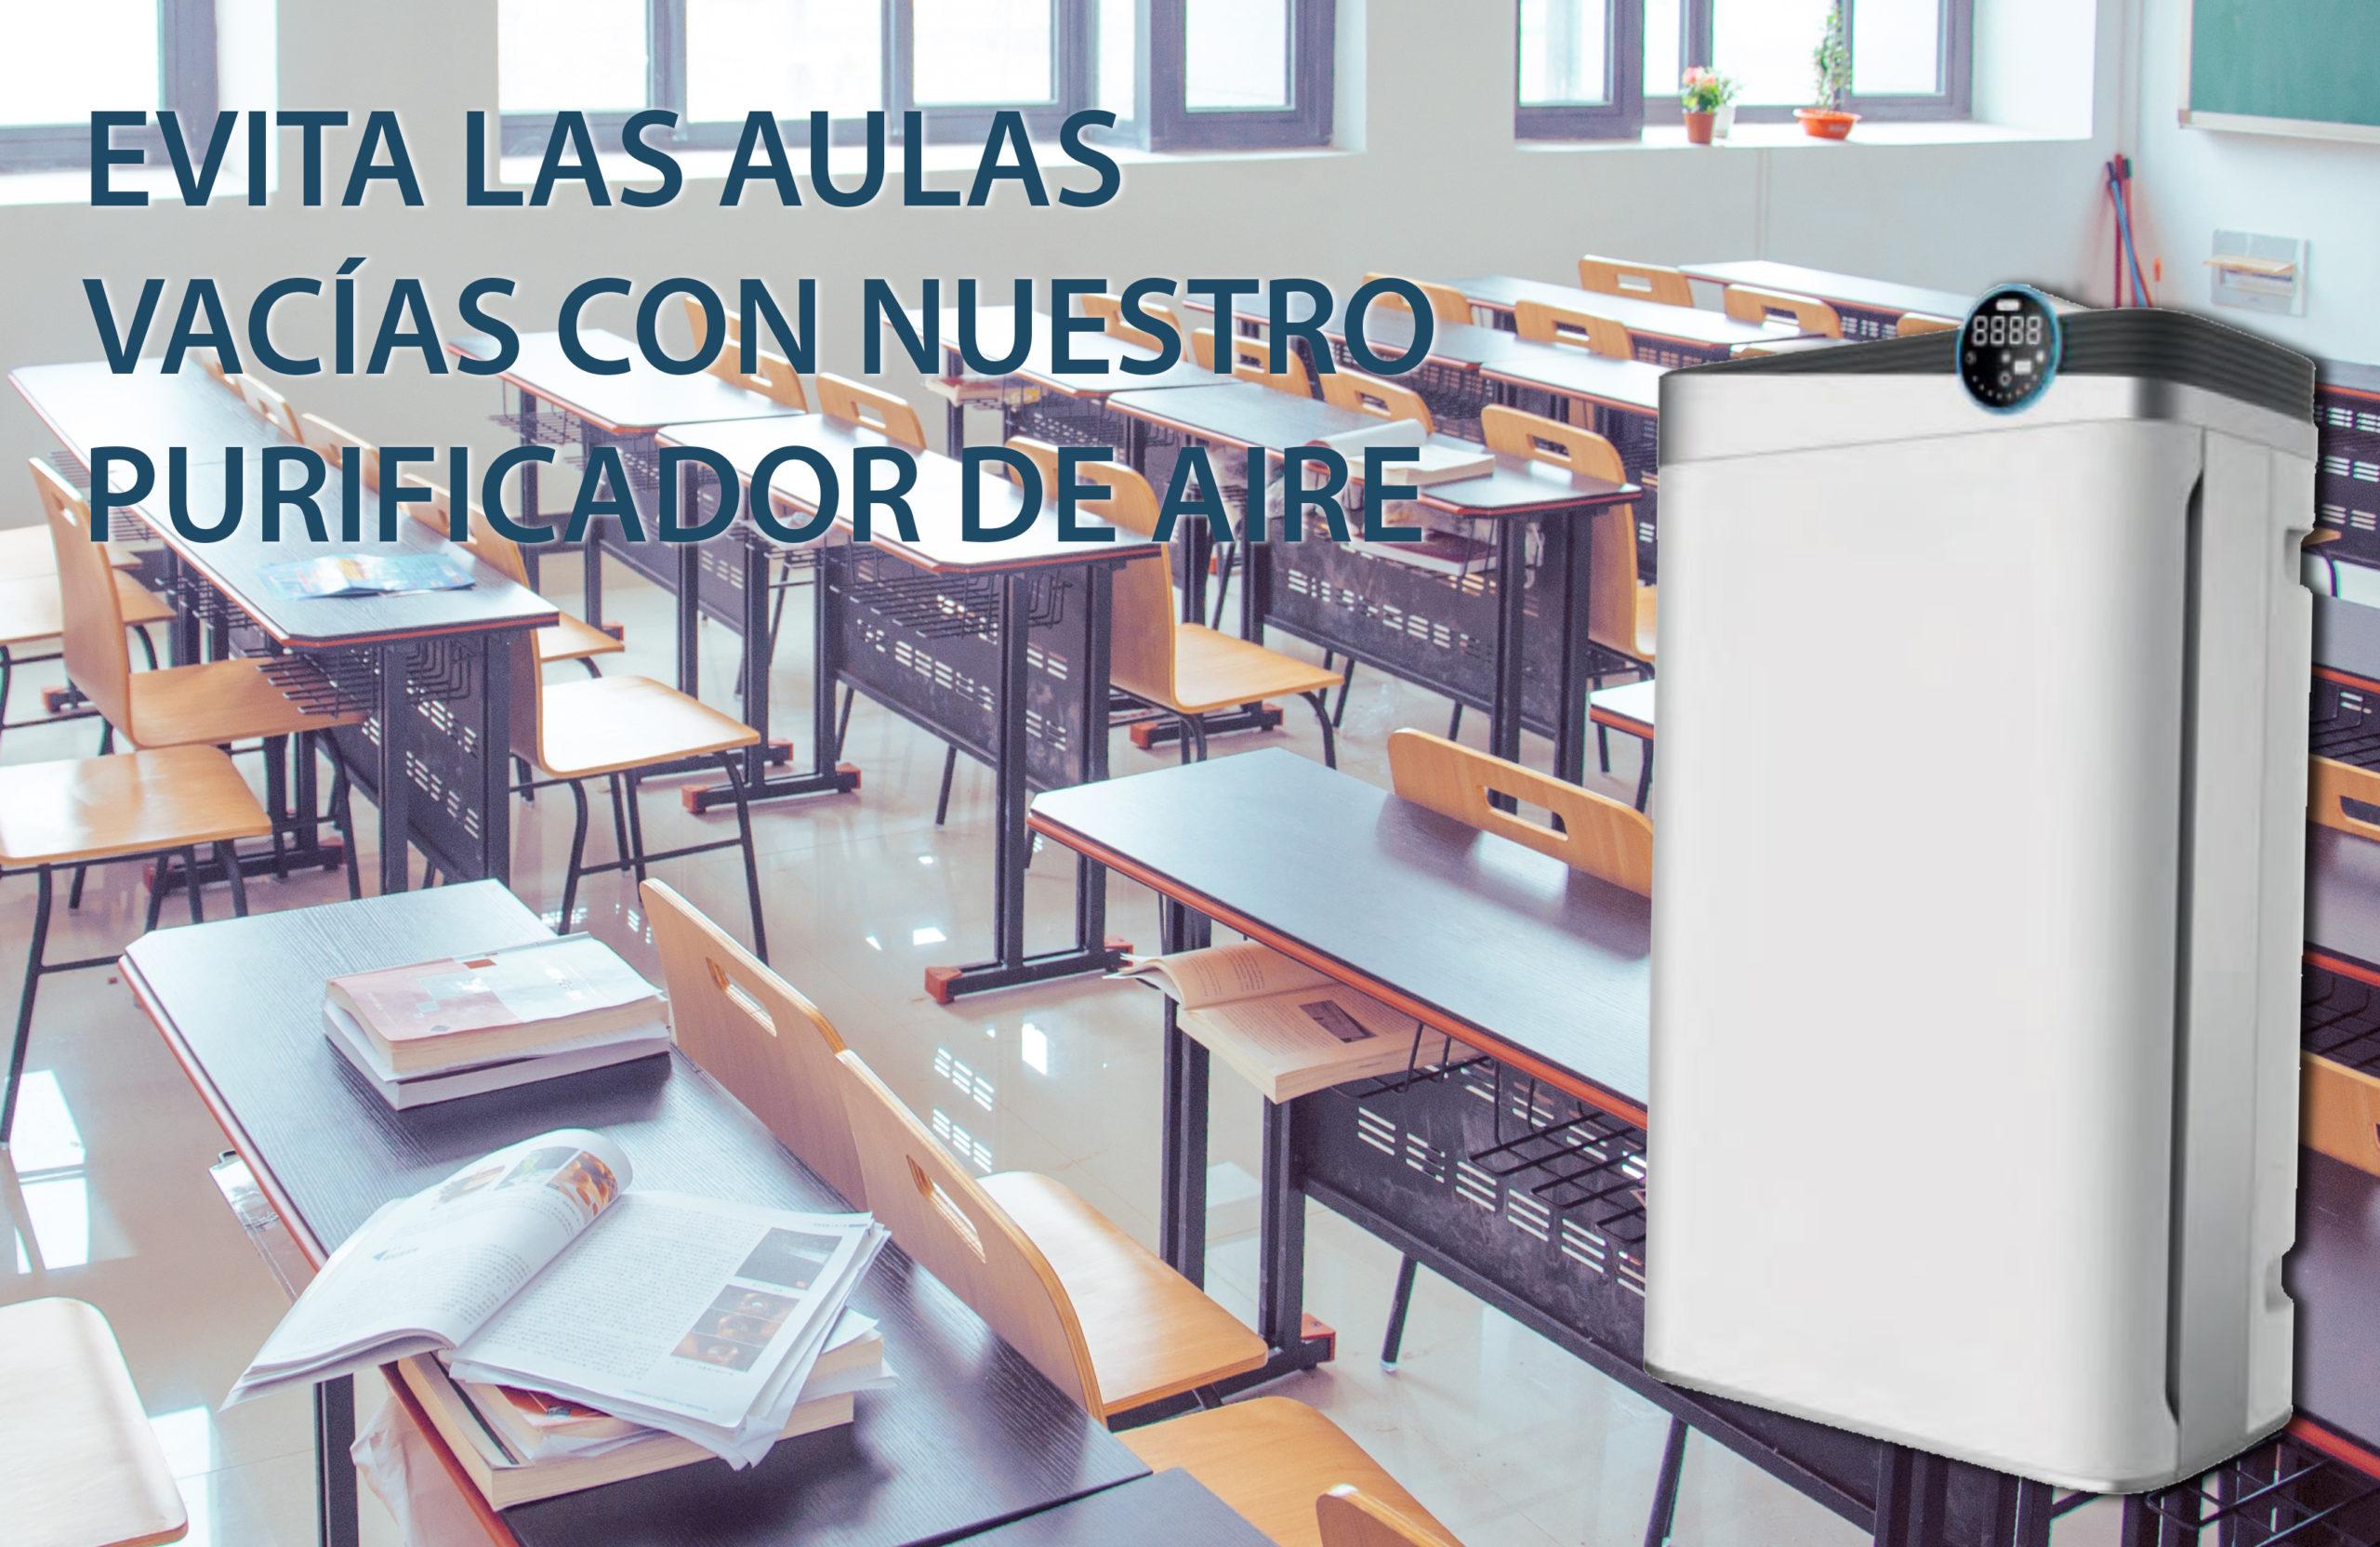 PURIFICA LAS CLASES